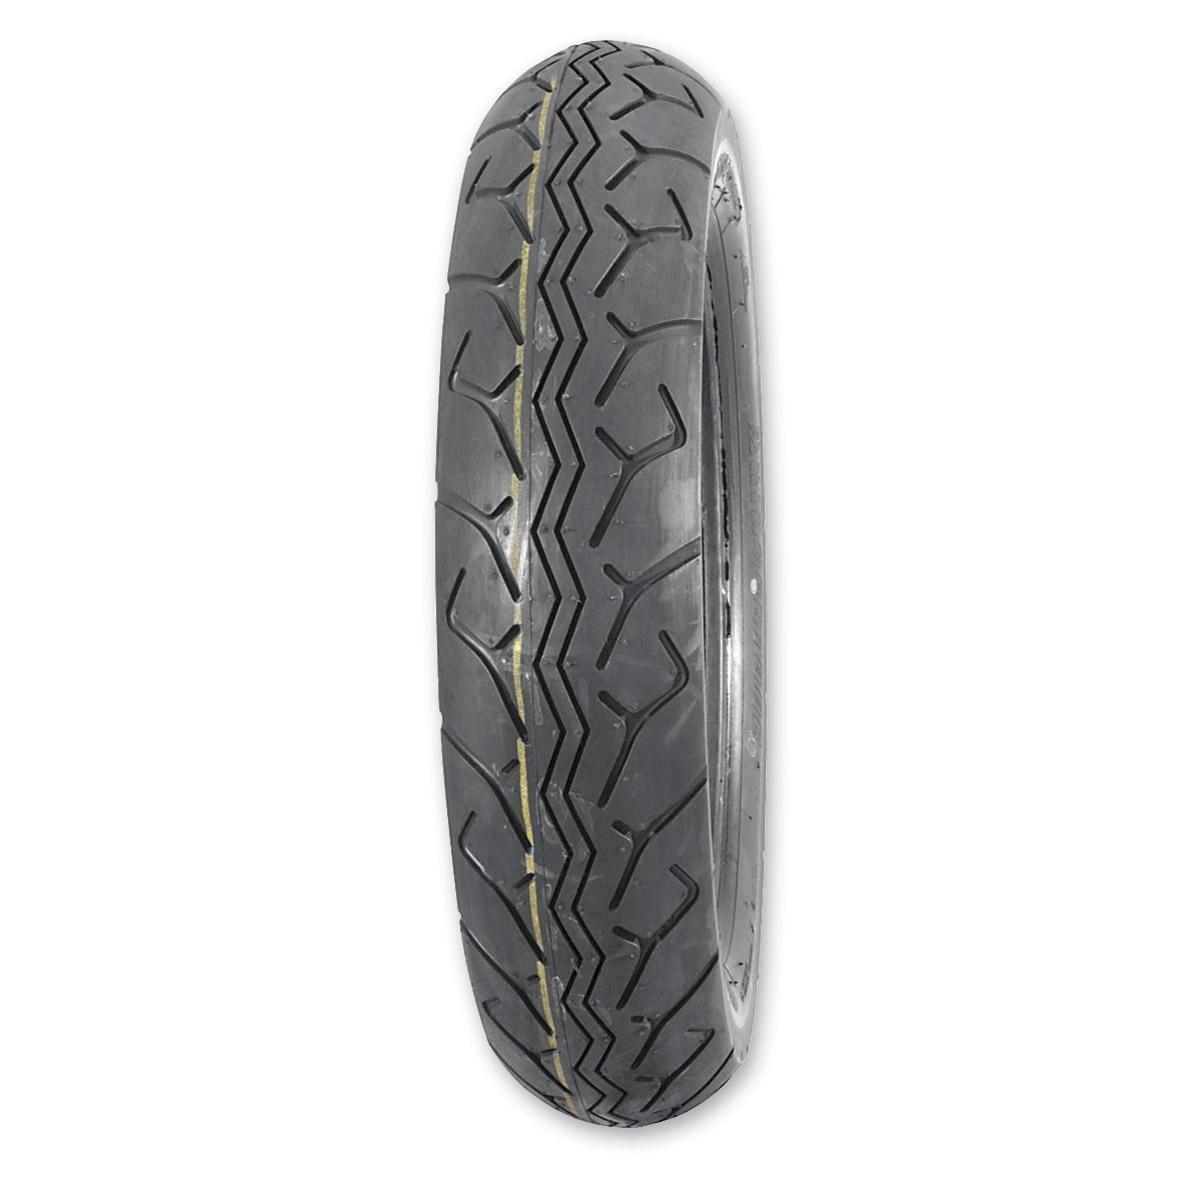 Bridgestone Exedra G703 130/90-16 Wide Whitewall Front Tire